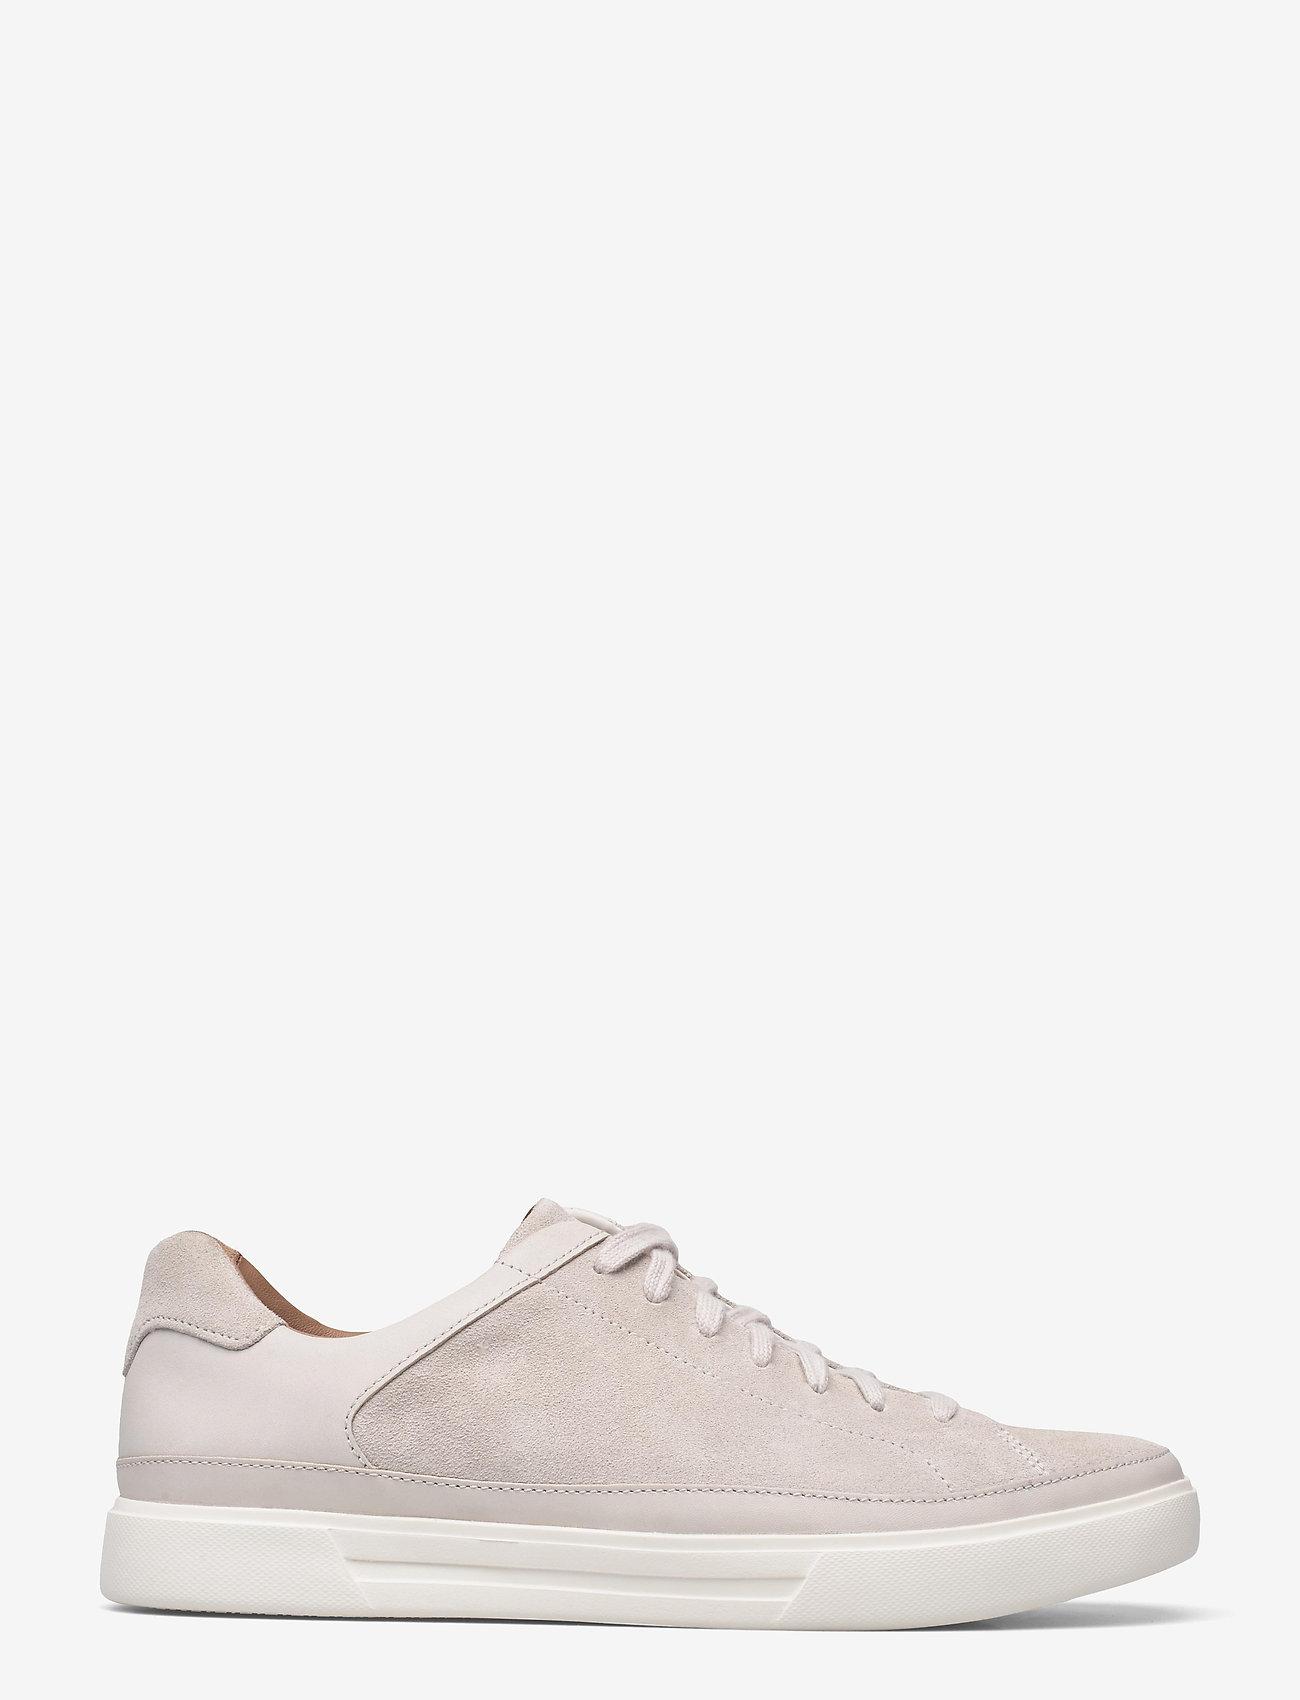 Clarks - Un Costa Tie - baskets basses - off white combi - 1